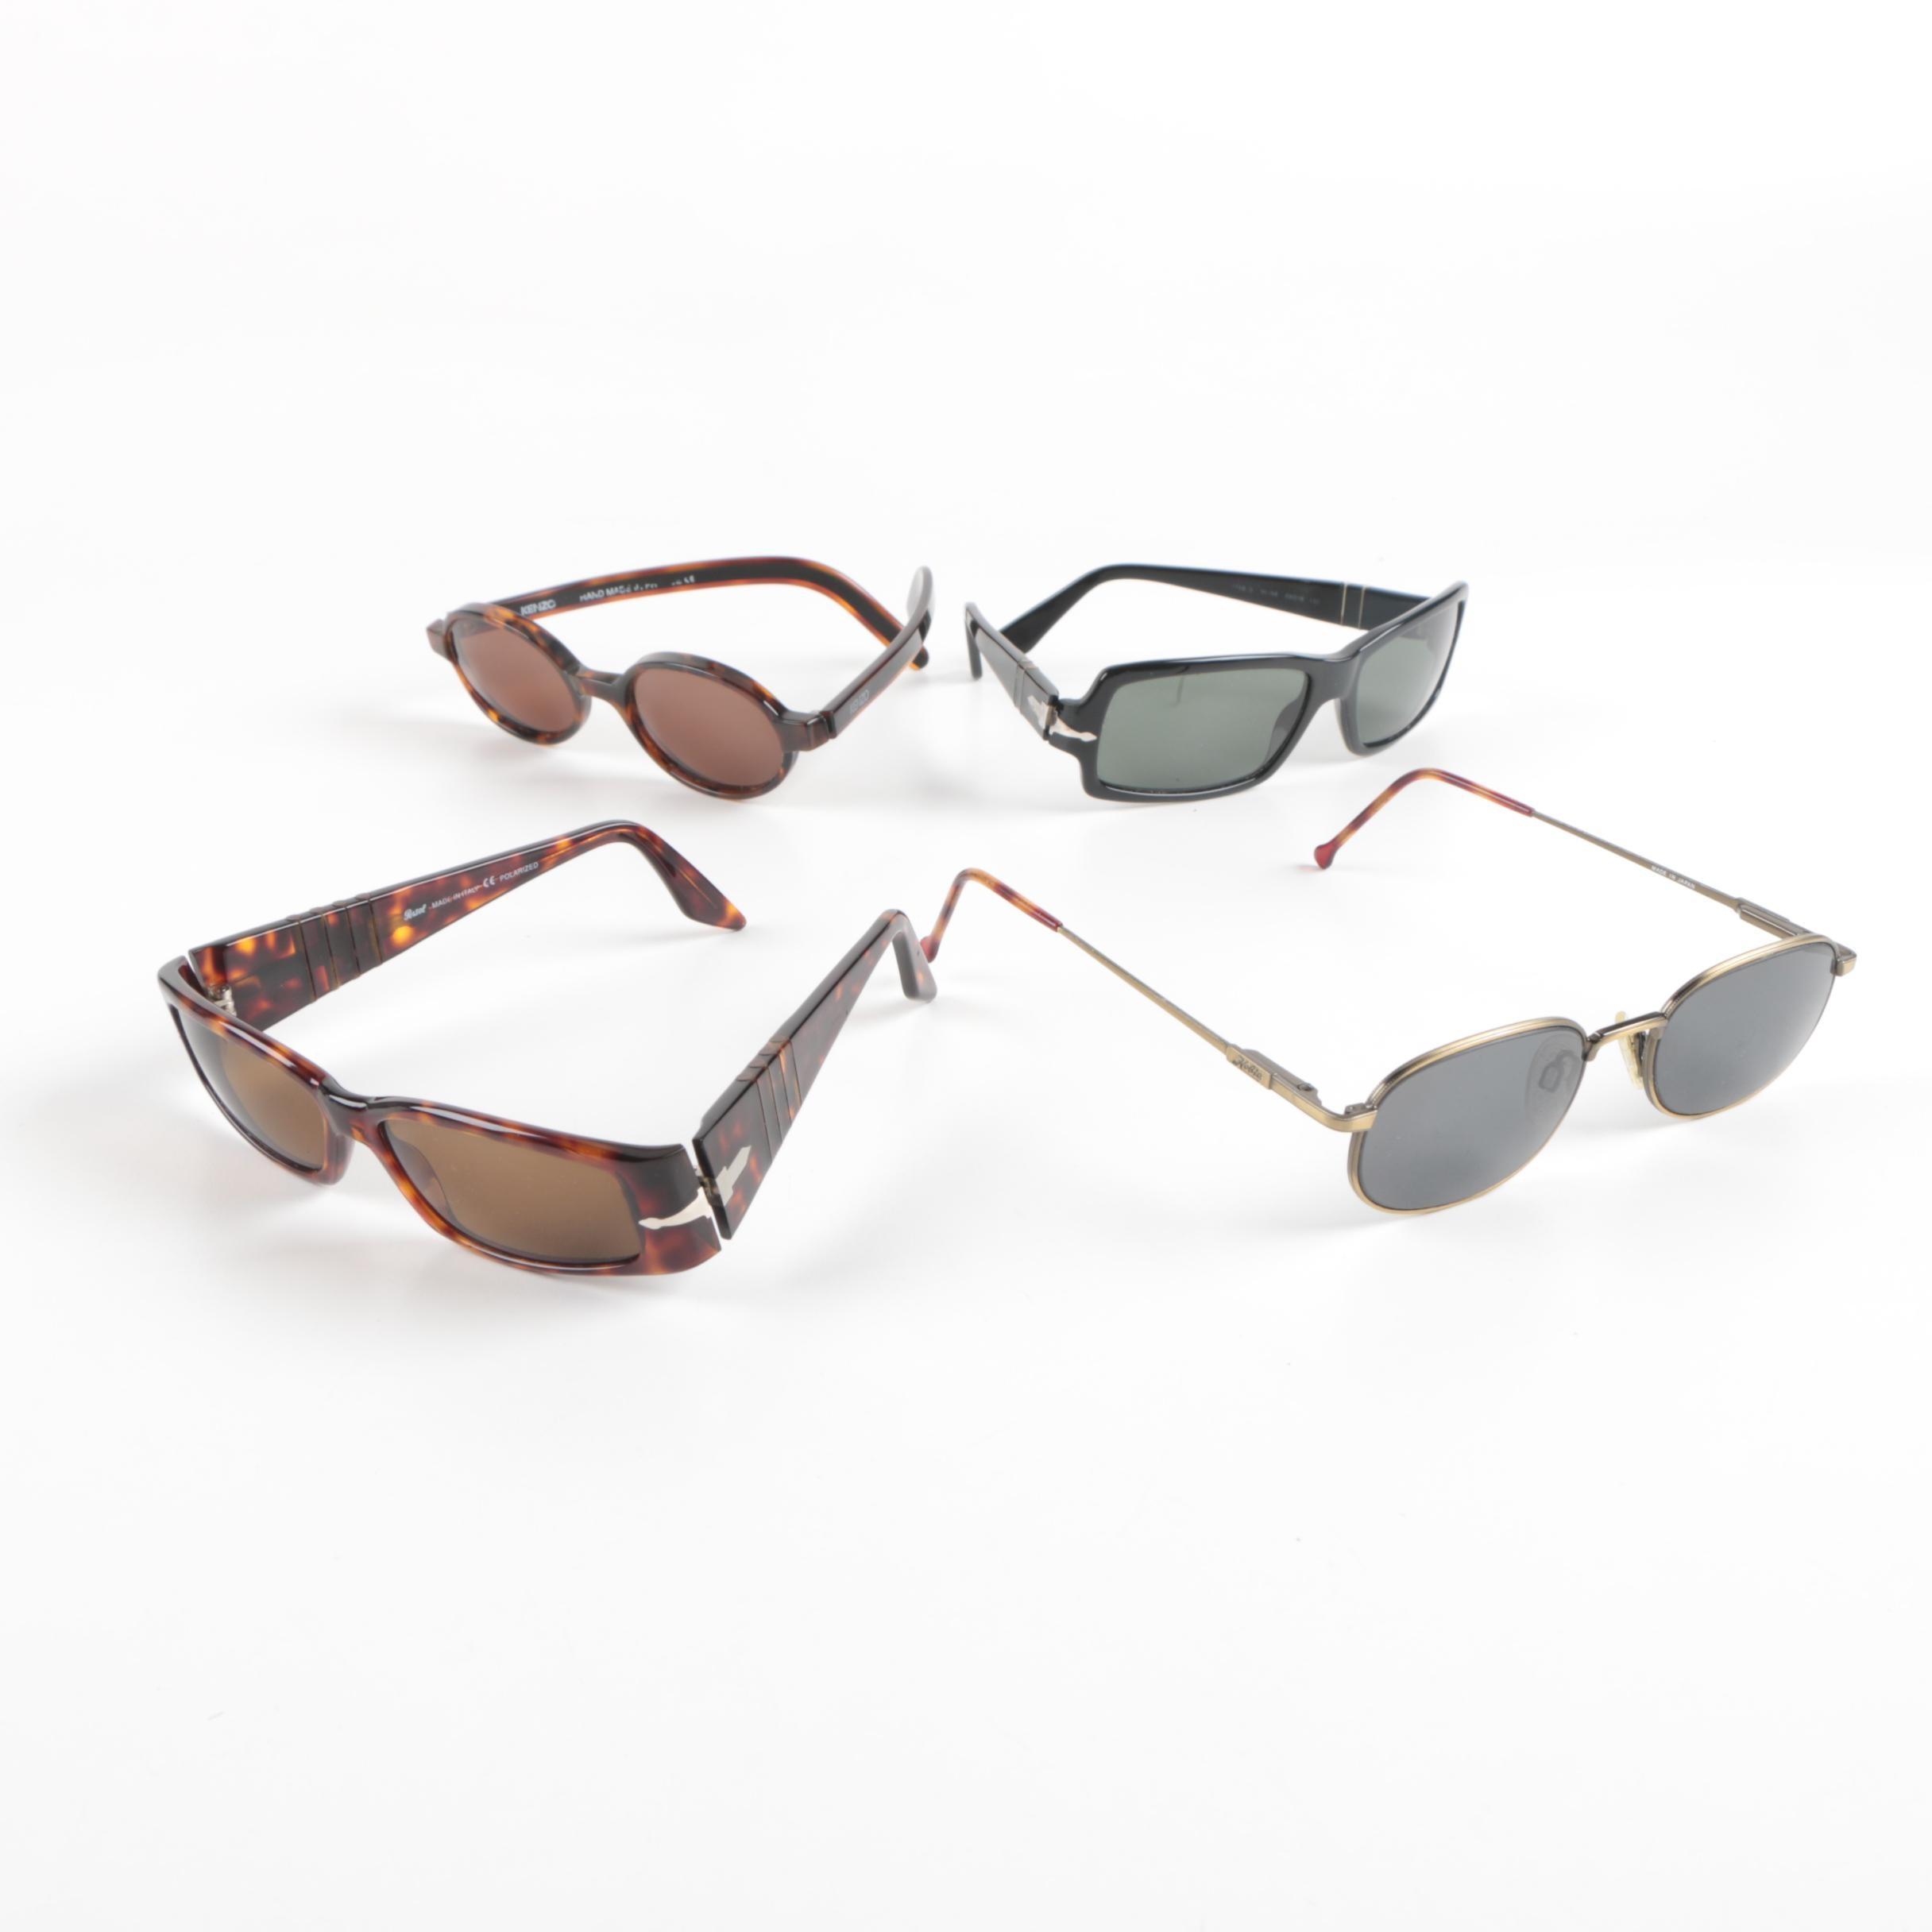 Sunglasses Including Persol